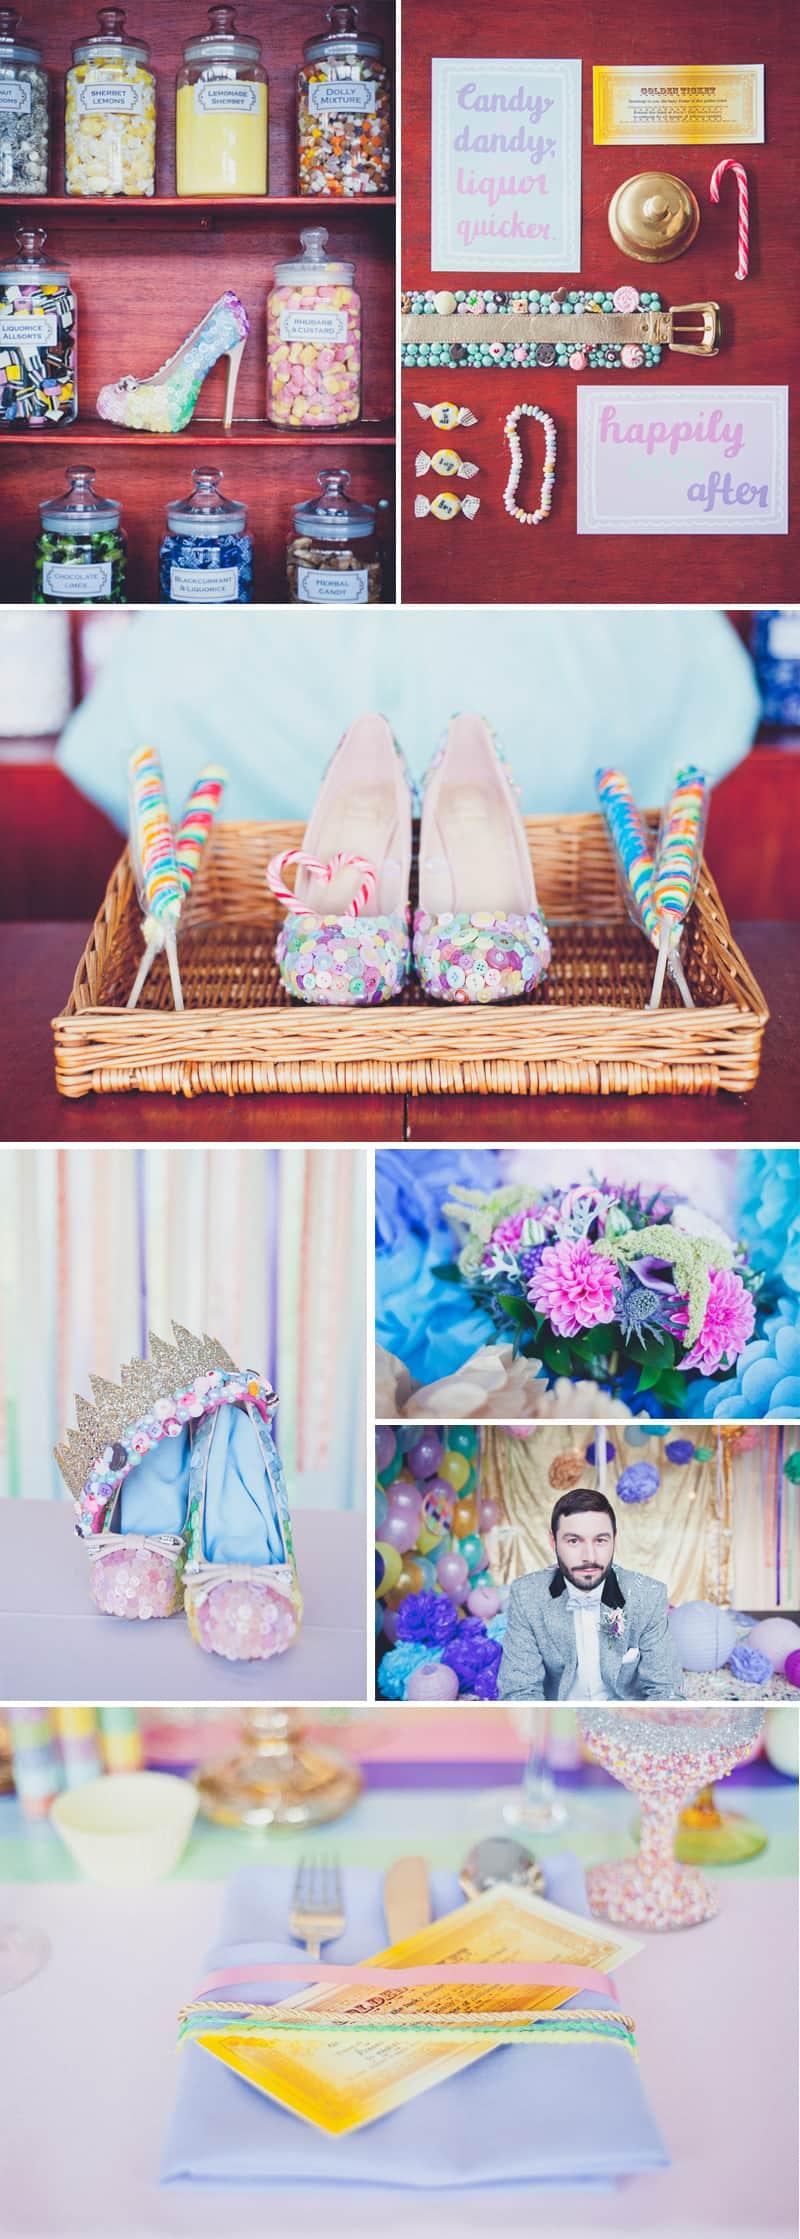 Willy Wonka Weird Wonderful Wedding World 1